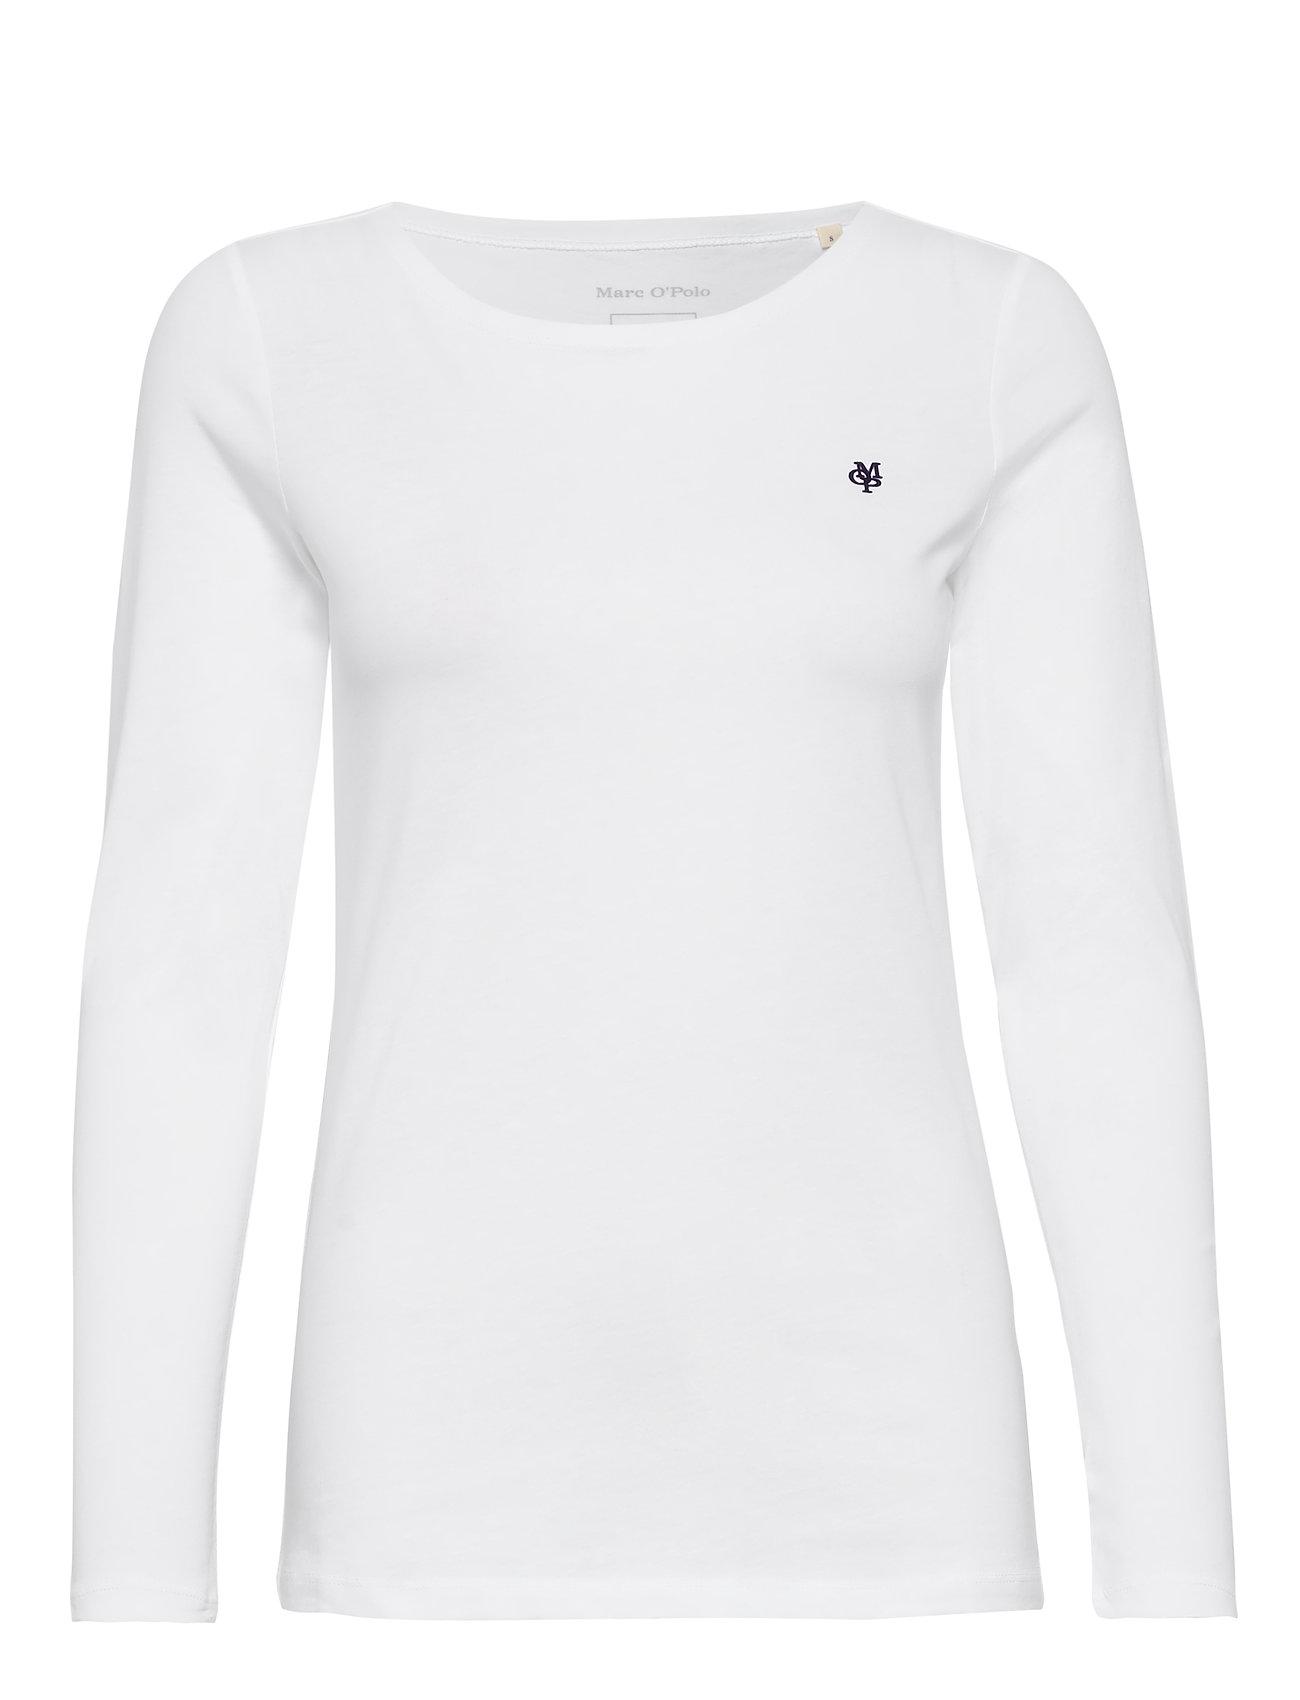 Image of T-Shirt Long Sleeve Langærmet T-shirt Hvid Marc O'Polo (3336494569)